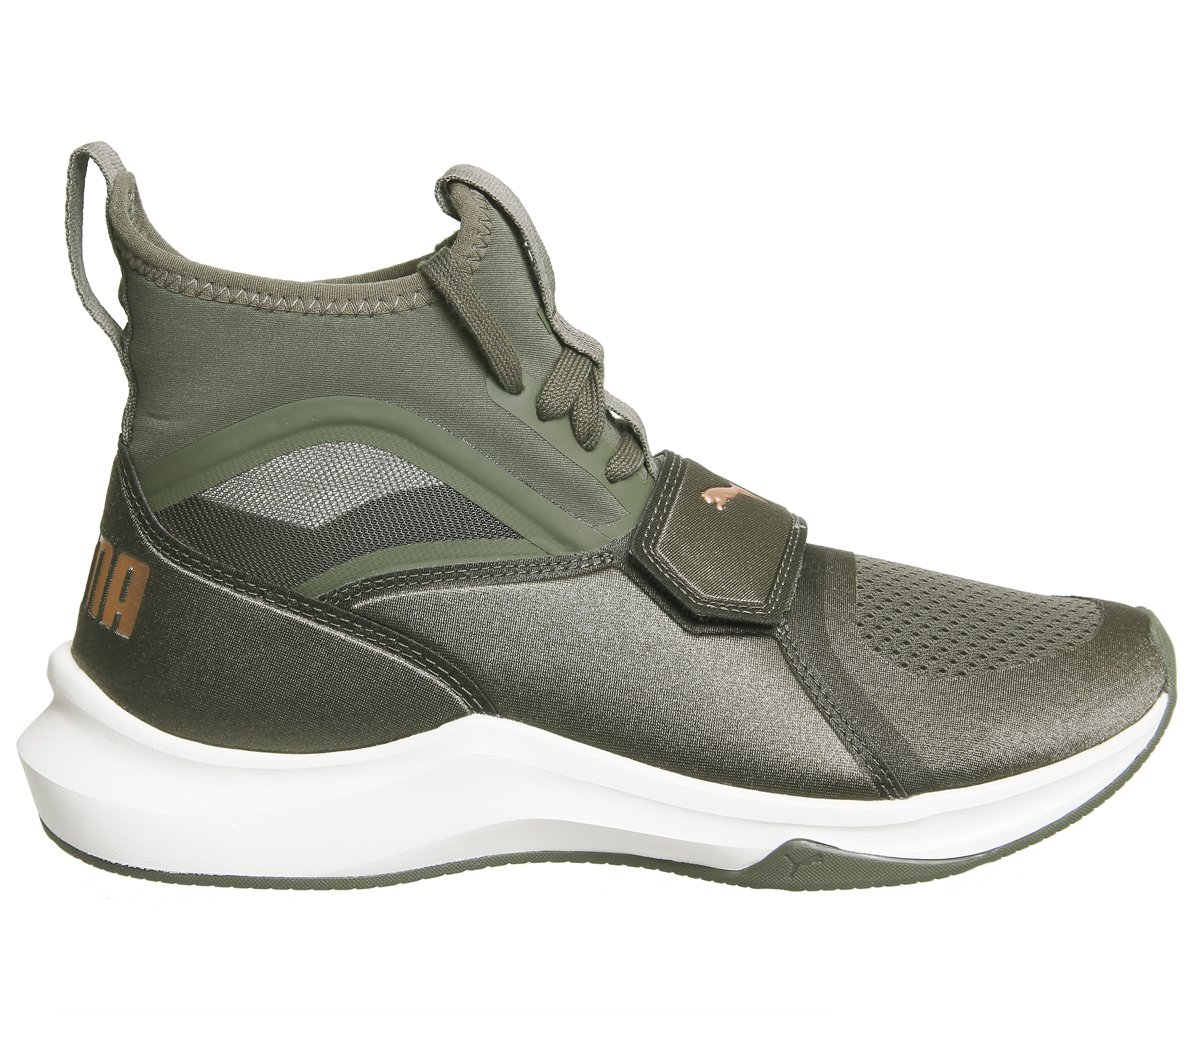 Puma Phenom Mujer Zapatillas Verde 37 EU|Verde